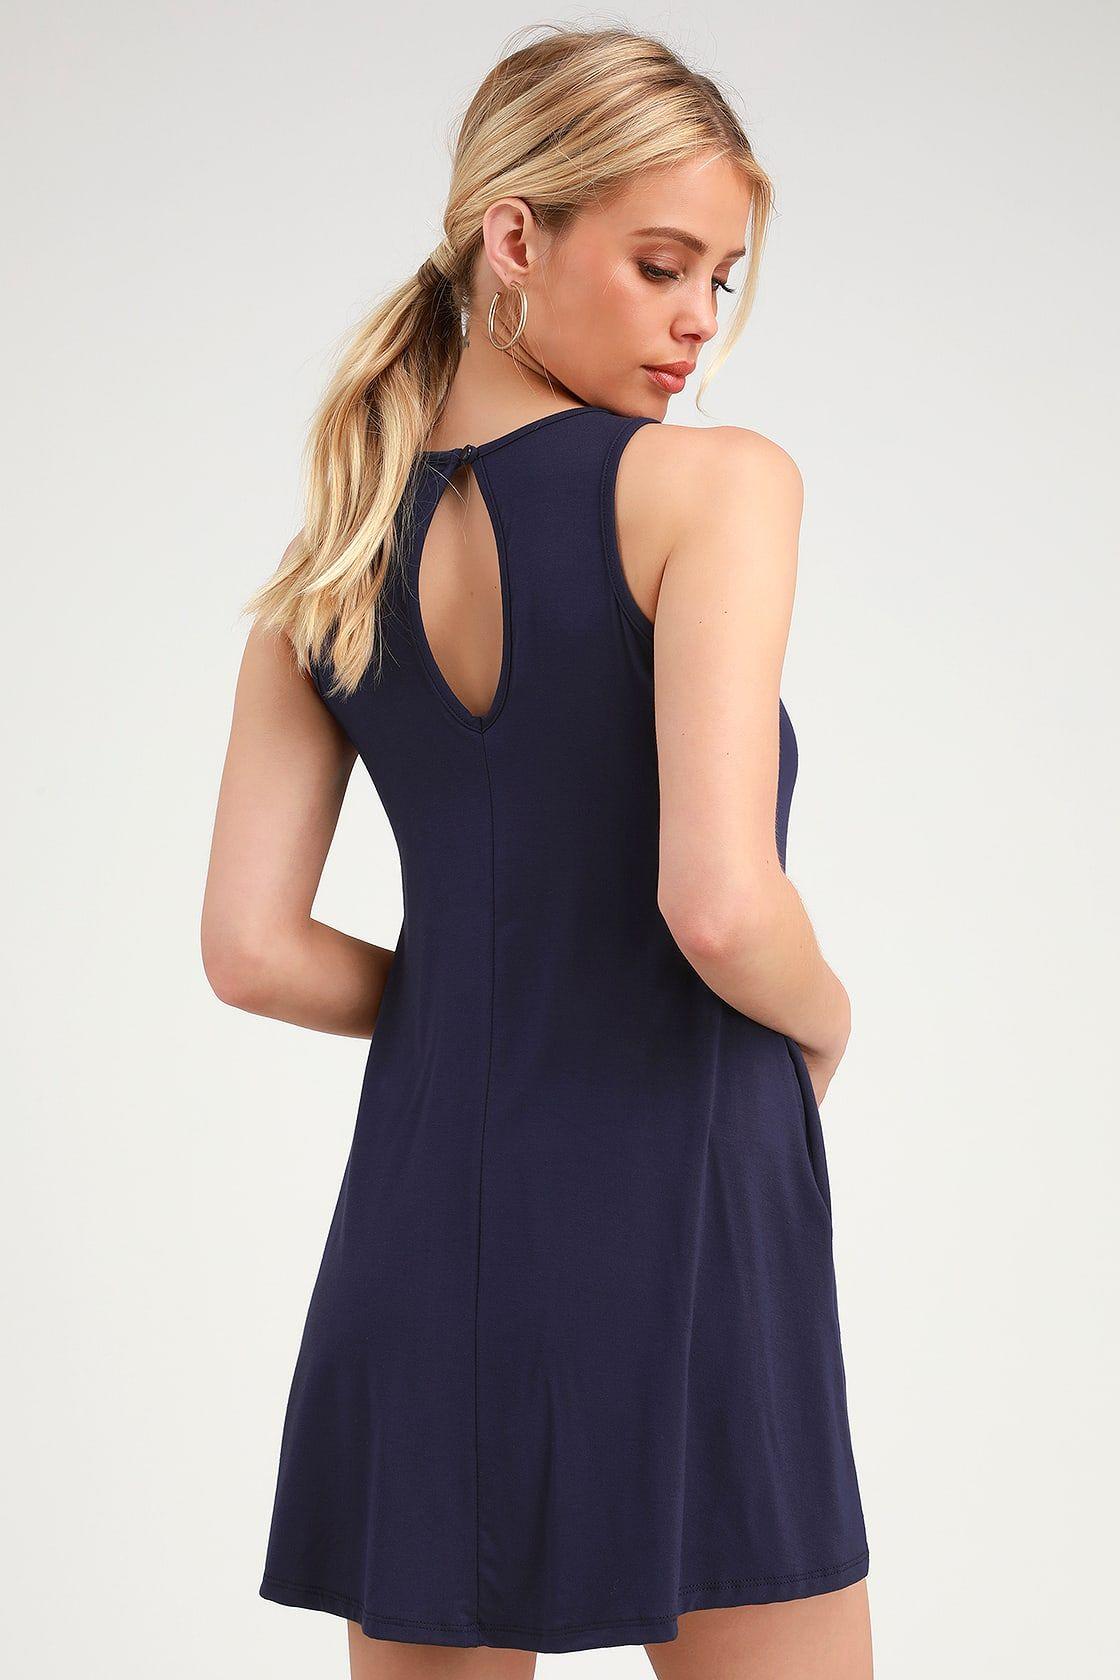 b92dfe9faa Fun Washed Navy Blue Dress - Blue Swing Dress - Blue Casual Dress